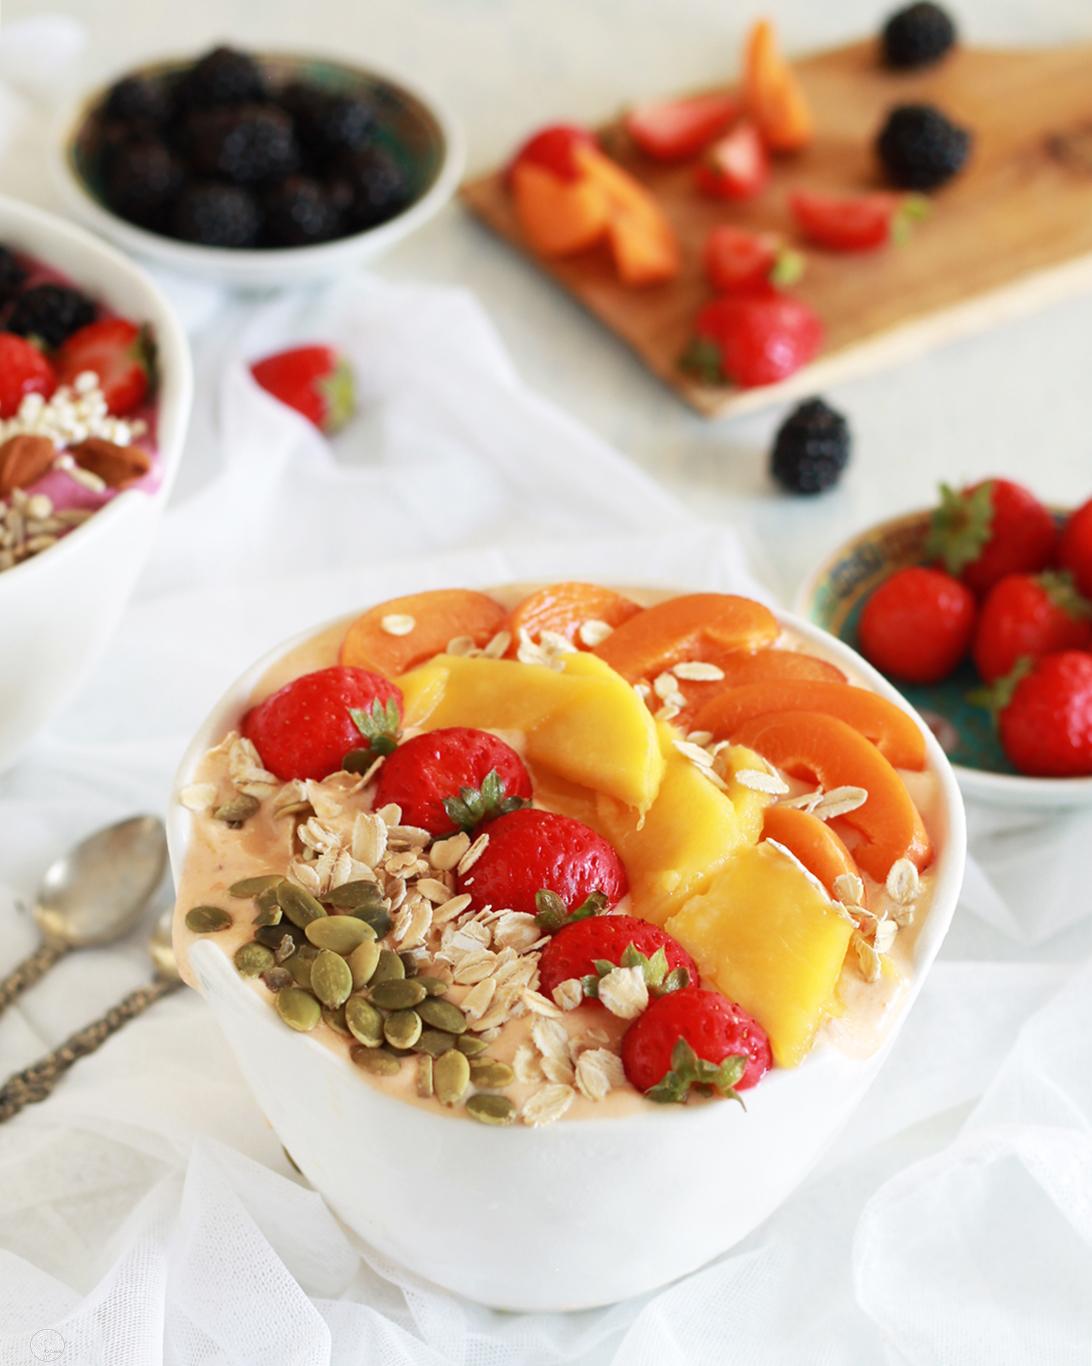 Smoothie bowl con mango e albicocche - La Cassata Celiaca